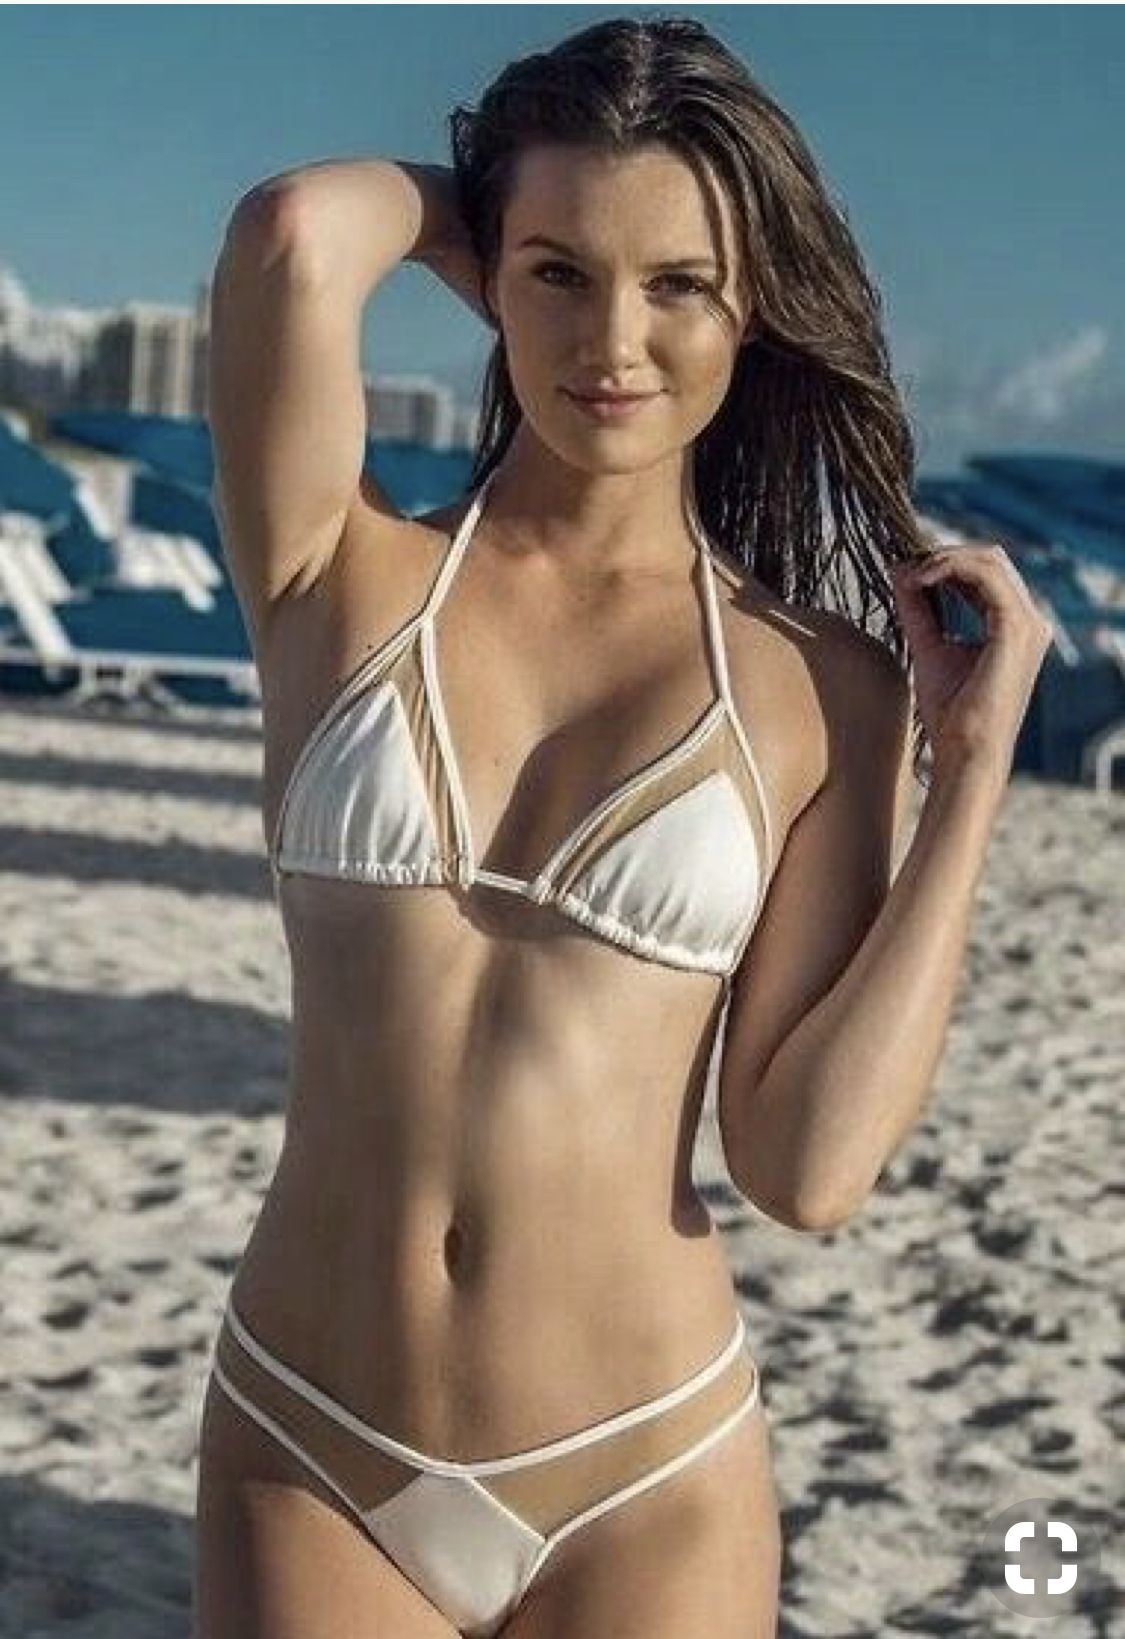 Bikini Erica Candice nude photos 2019